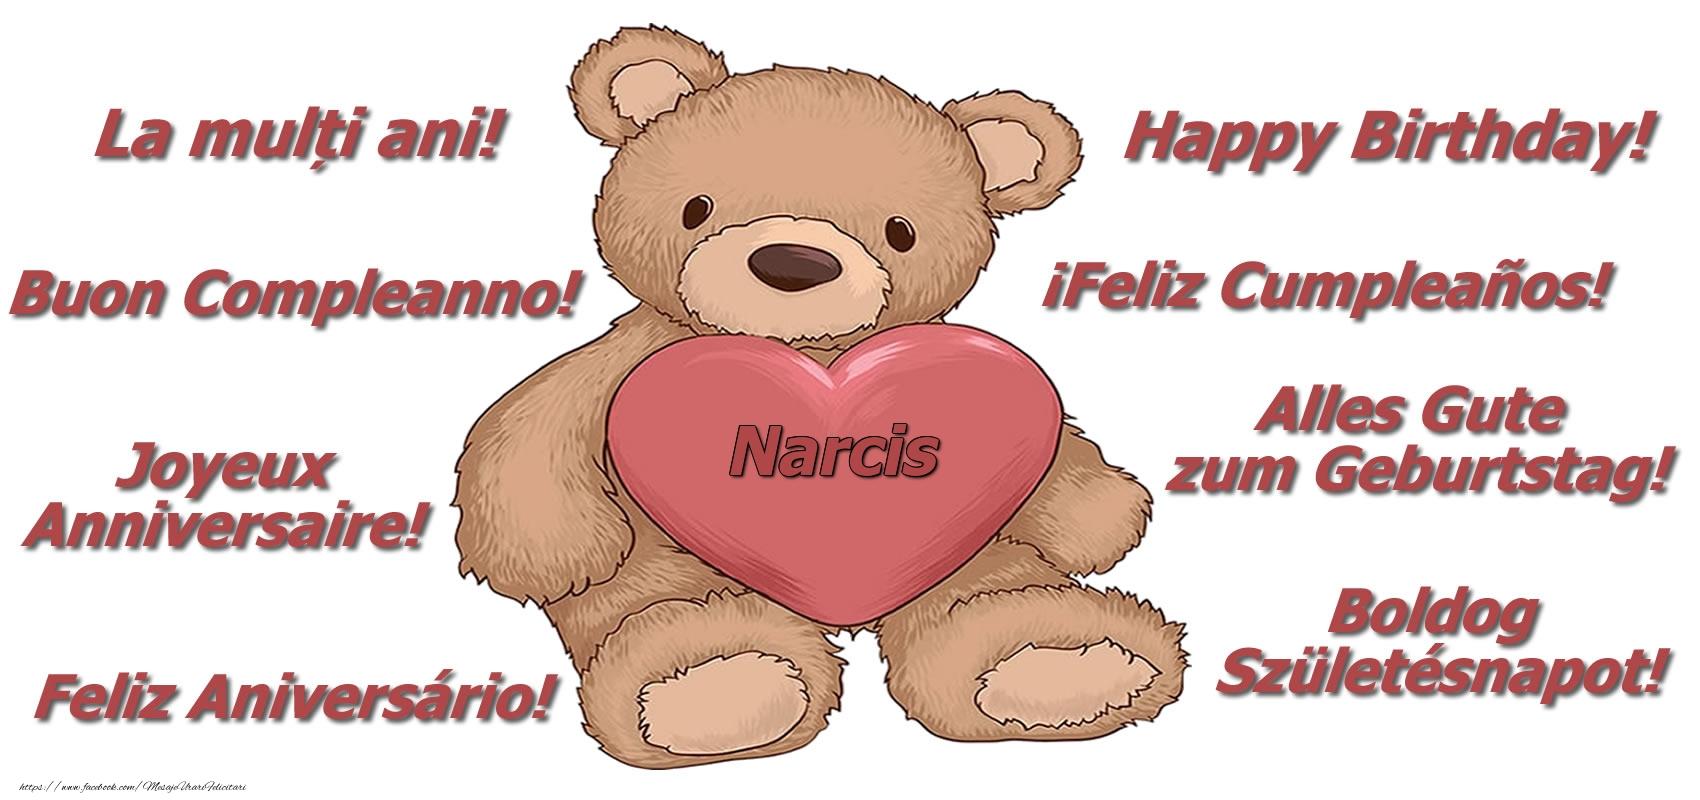 Felicitari de zi de nastere - La multi ani Narcis! - Ursulet